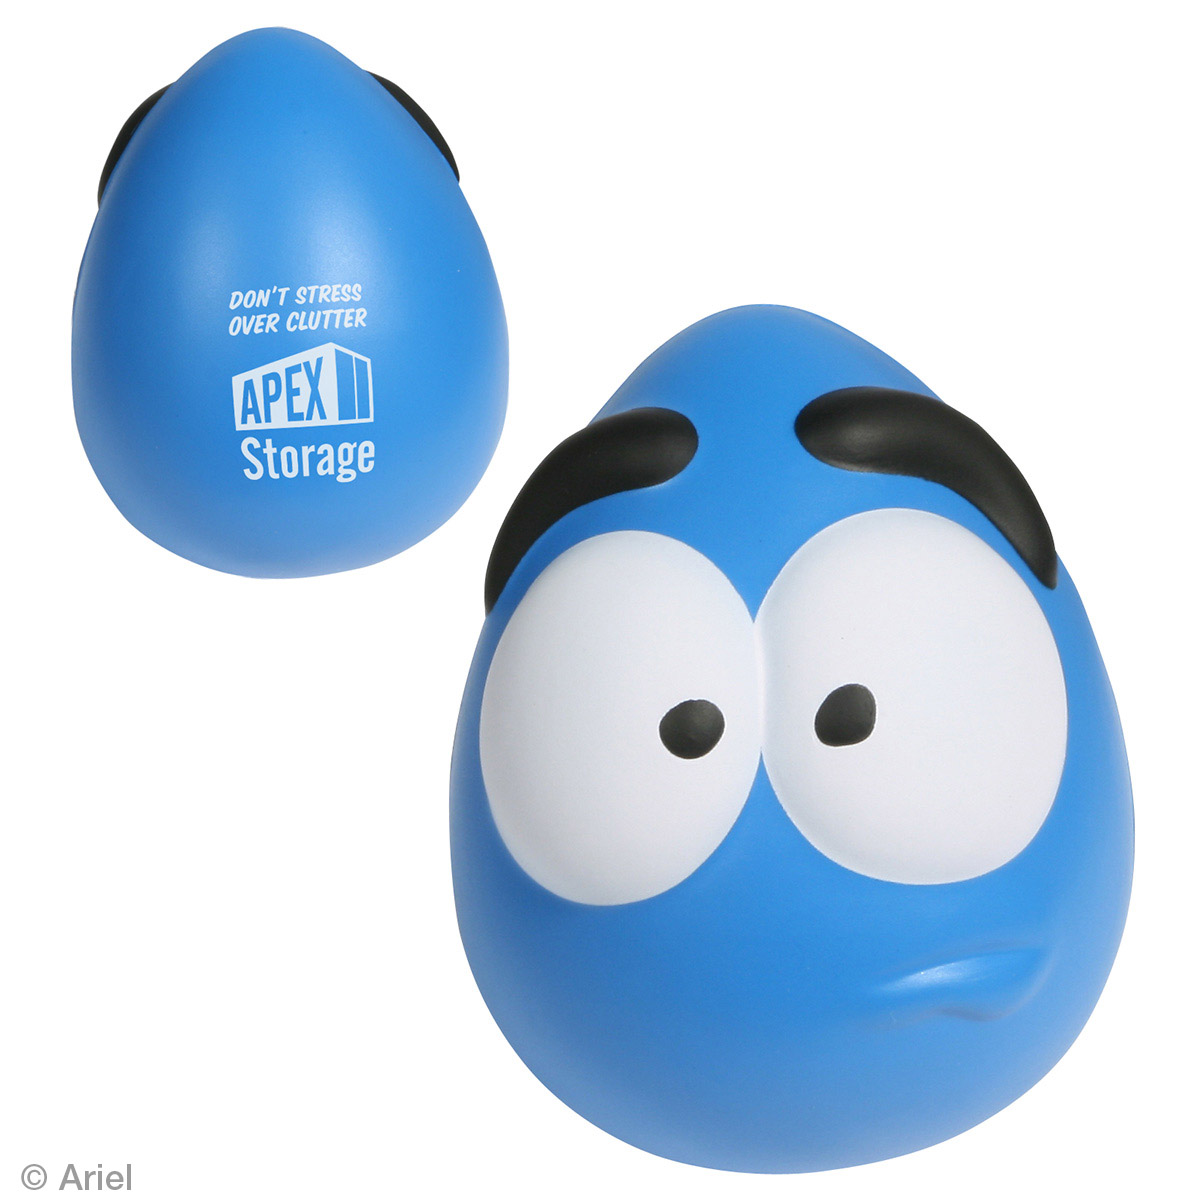 Stressed Mood Maniac Wobbler Stress Reliever, LCA-WS10 - 1 Colour Imprint